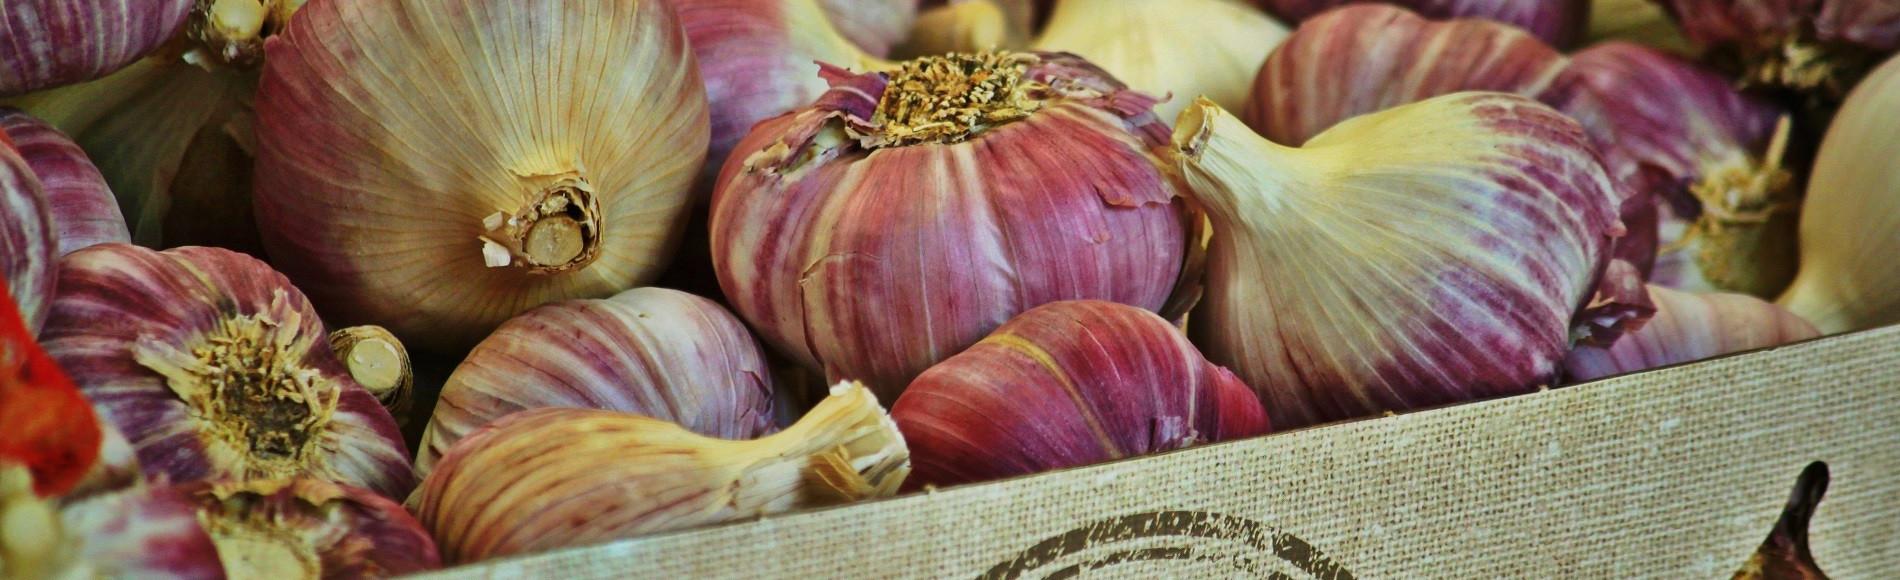 garlic-868878